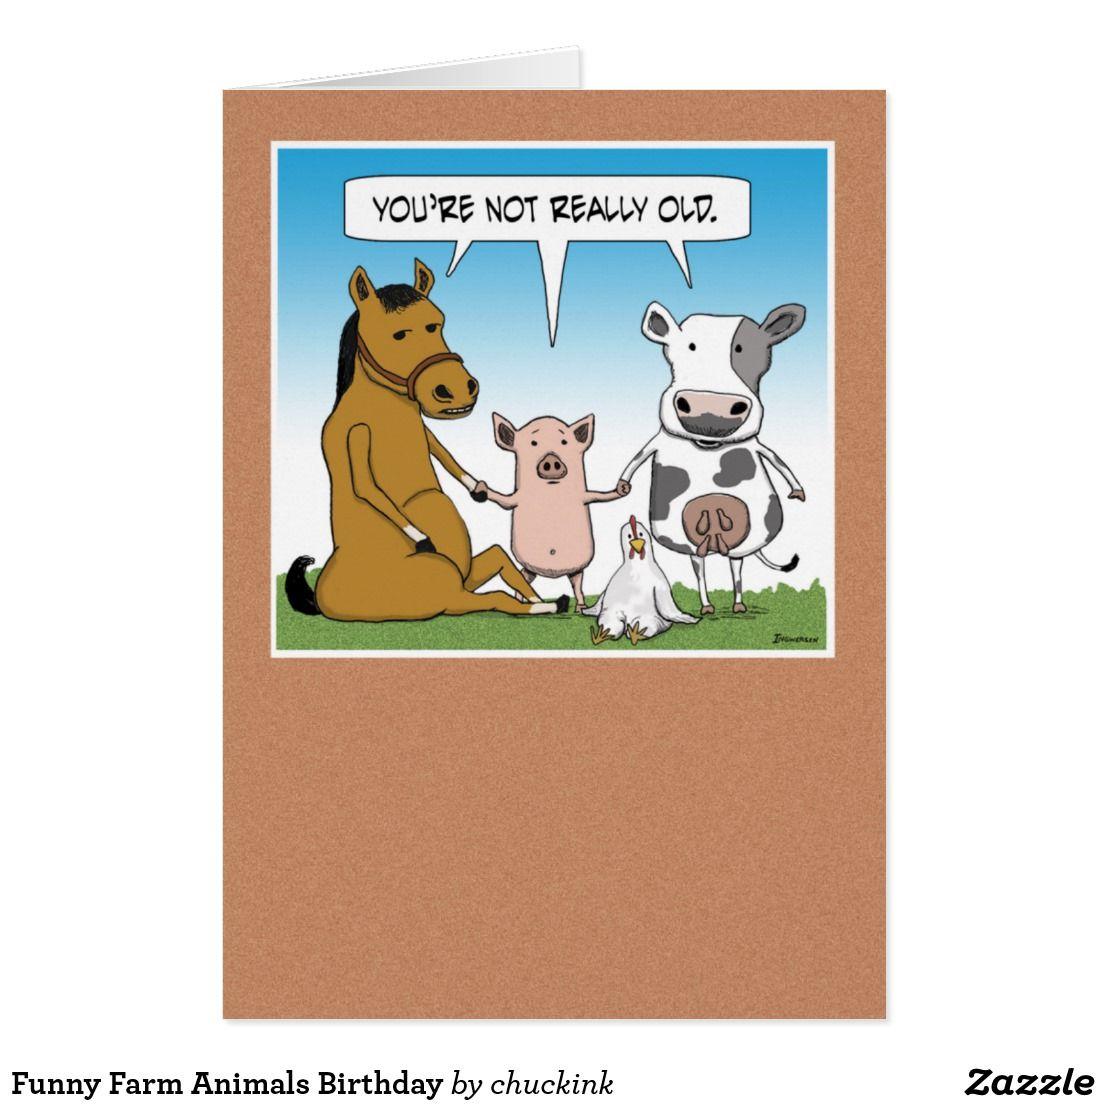 Funny farm animals birthday card funny greeting cards pinterest funny farm animals birthday card m4hsunfo